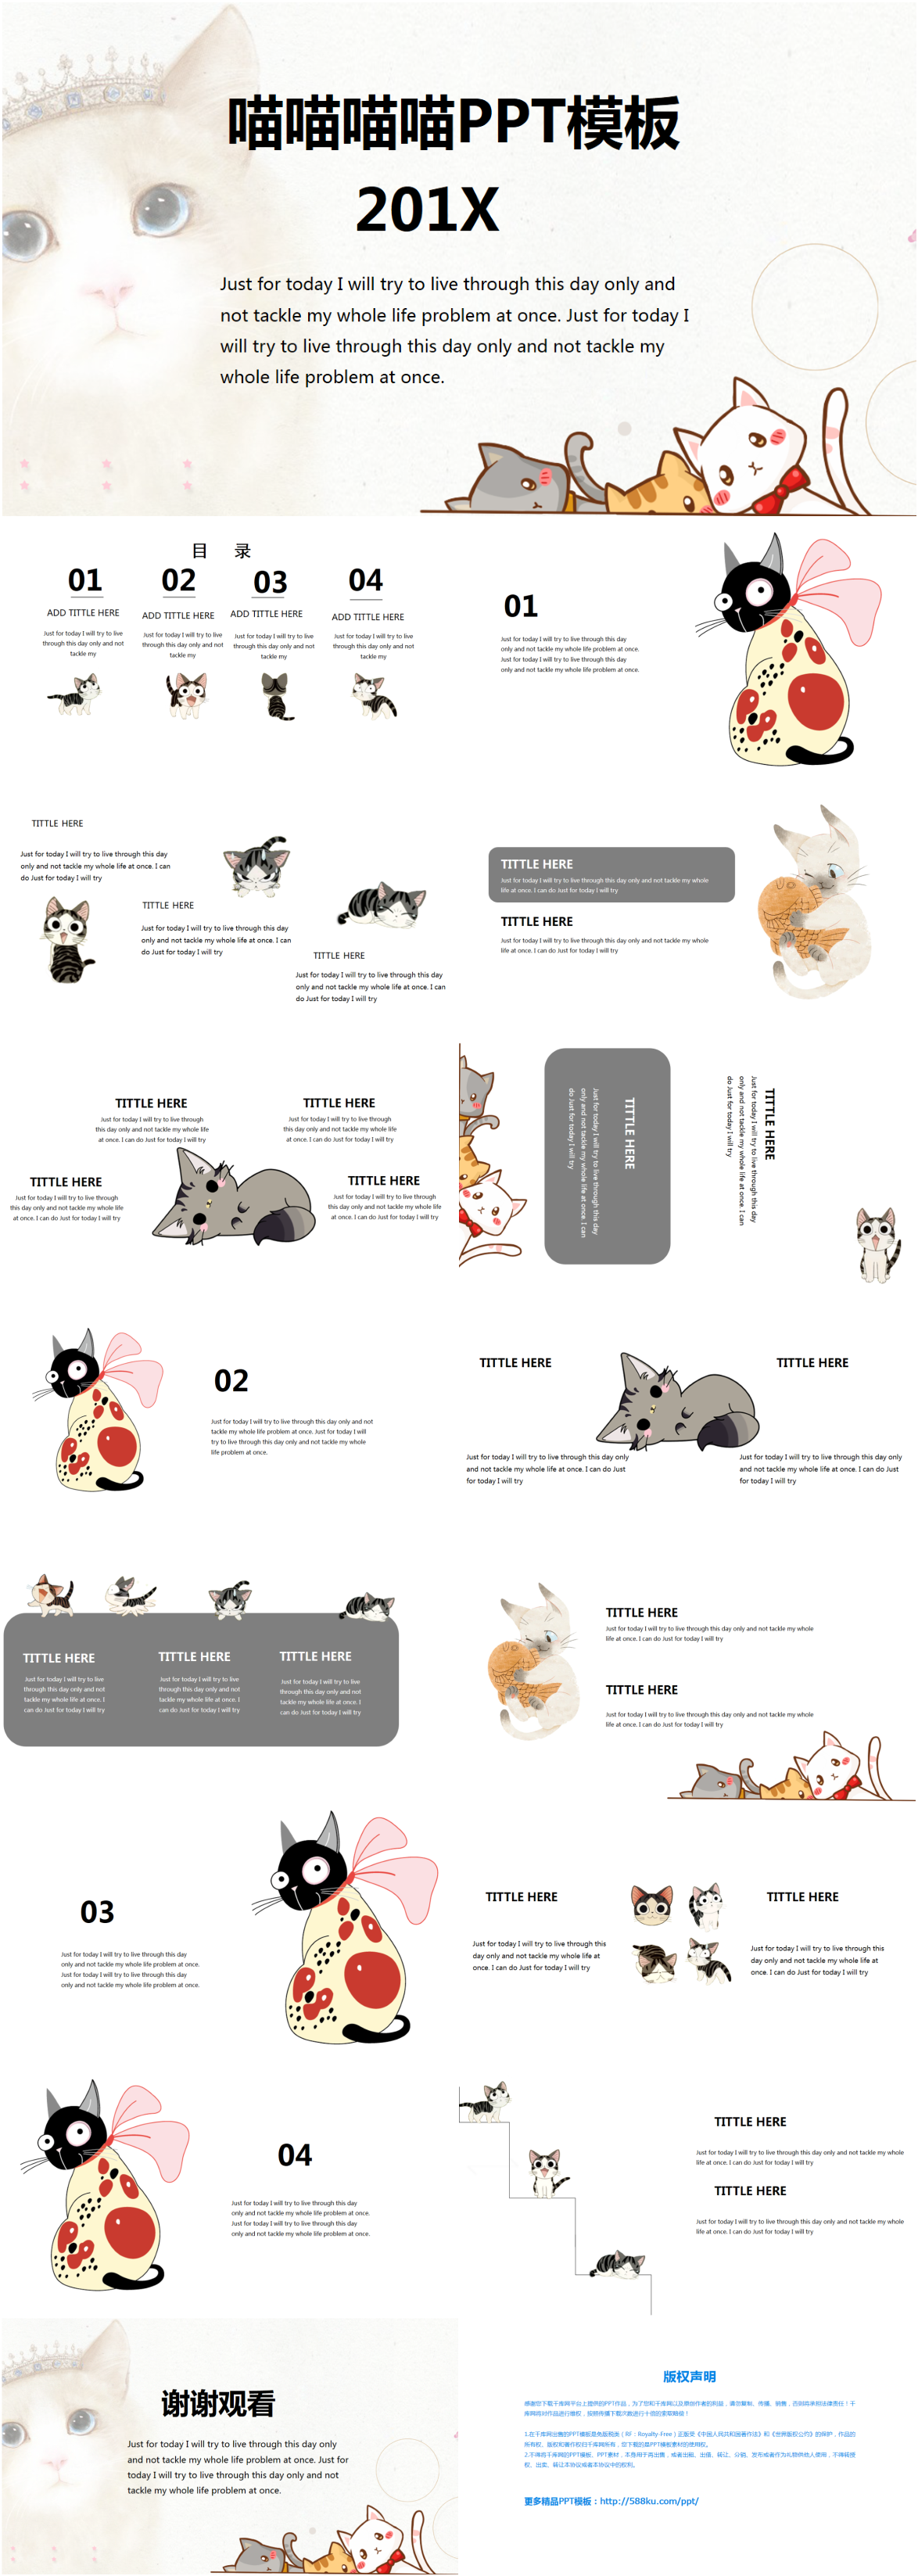 Template Ppt Universal Multi Tujuan Kucing Lucu Dan Lucu Gambar Unduh Gratis Power Point 650057018 Format Gambar Pptx Lovepik Com